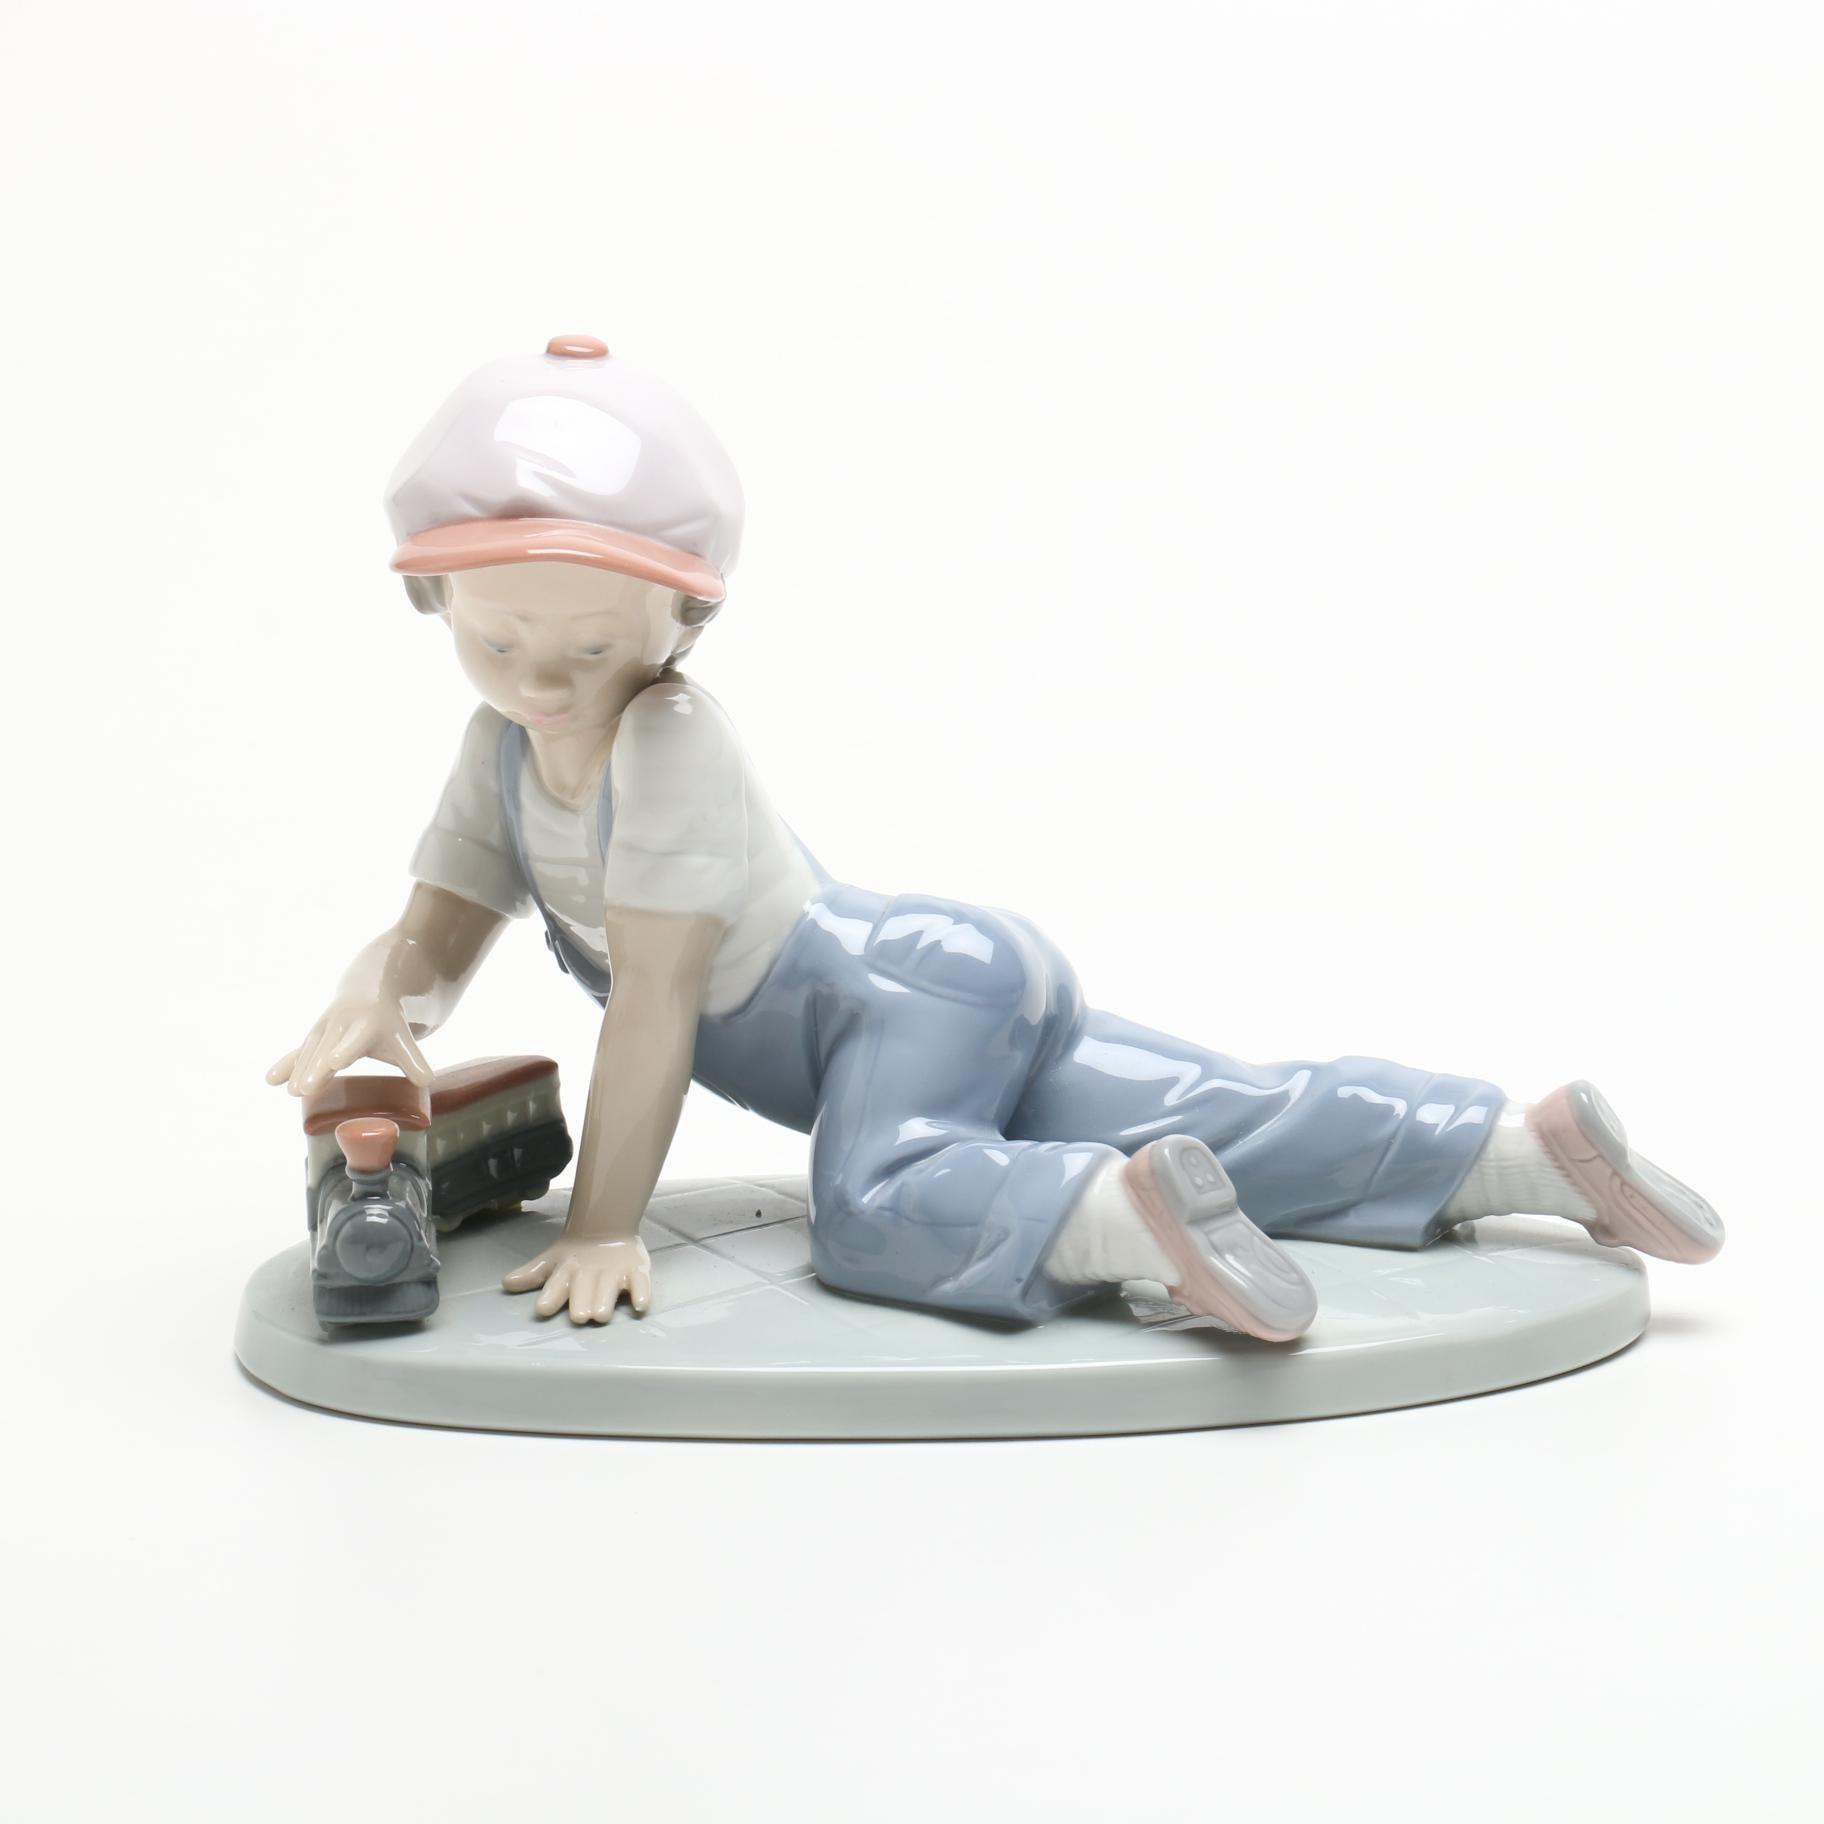 "1992 Lladró Collectors Society ""It Wasn't Me Figurine"" Porcelain Figurine"